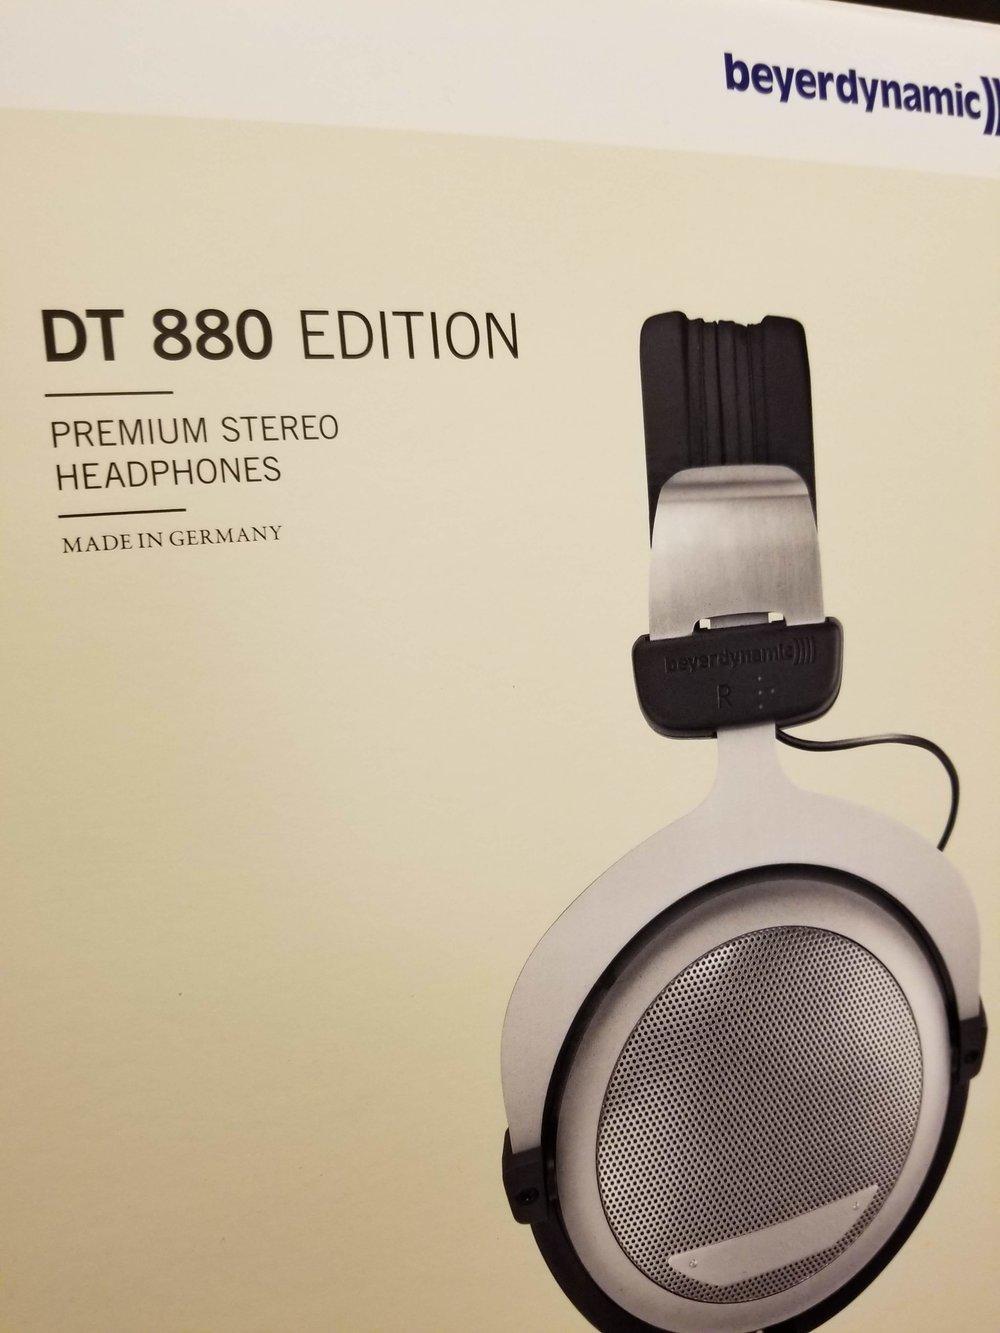 Beyerdynamic DT 880 Edition 600 Ohm Review — World Bolding